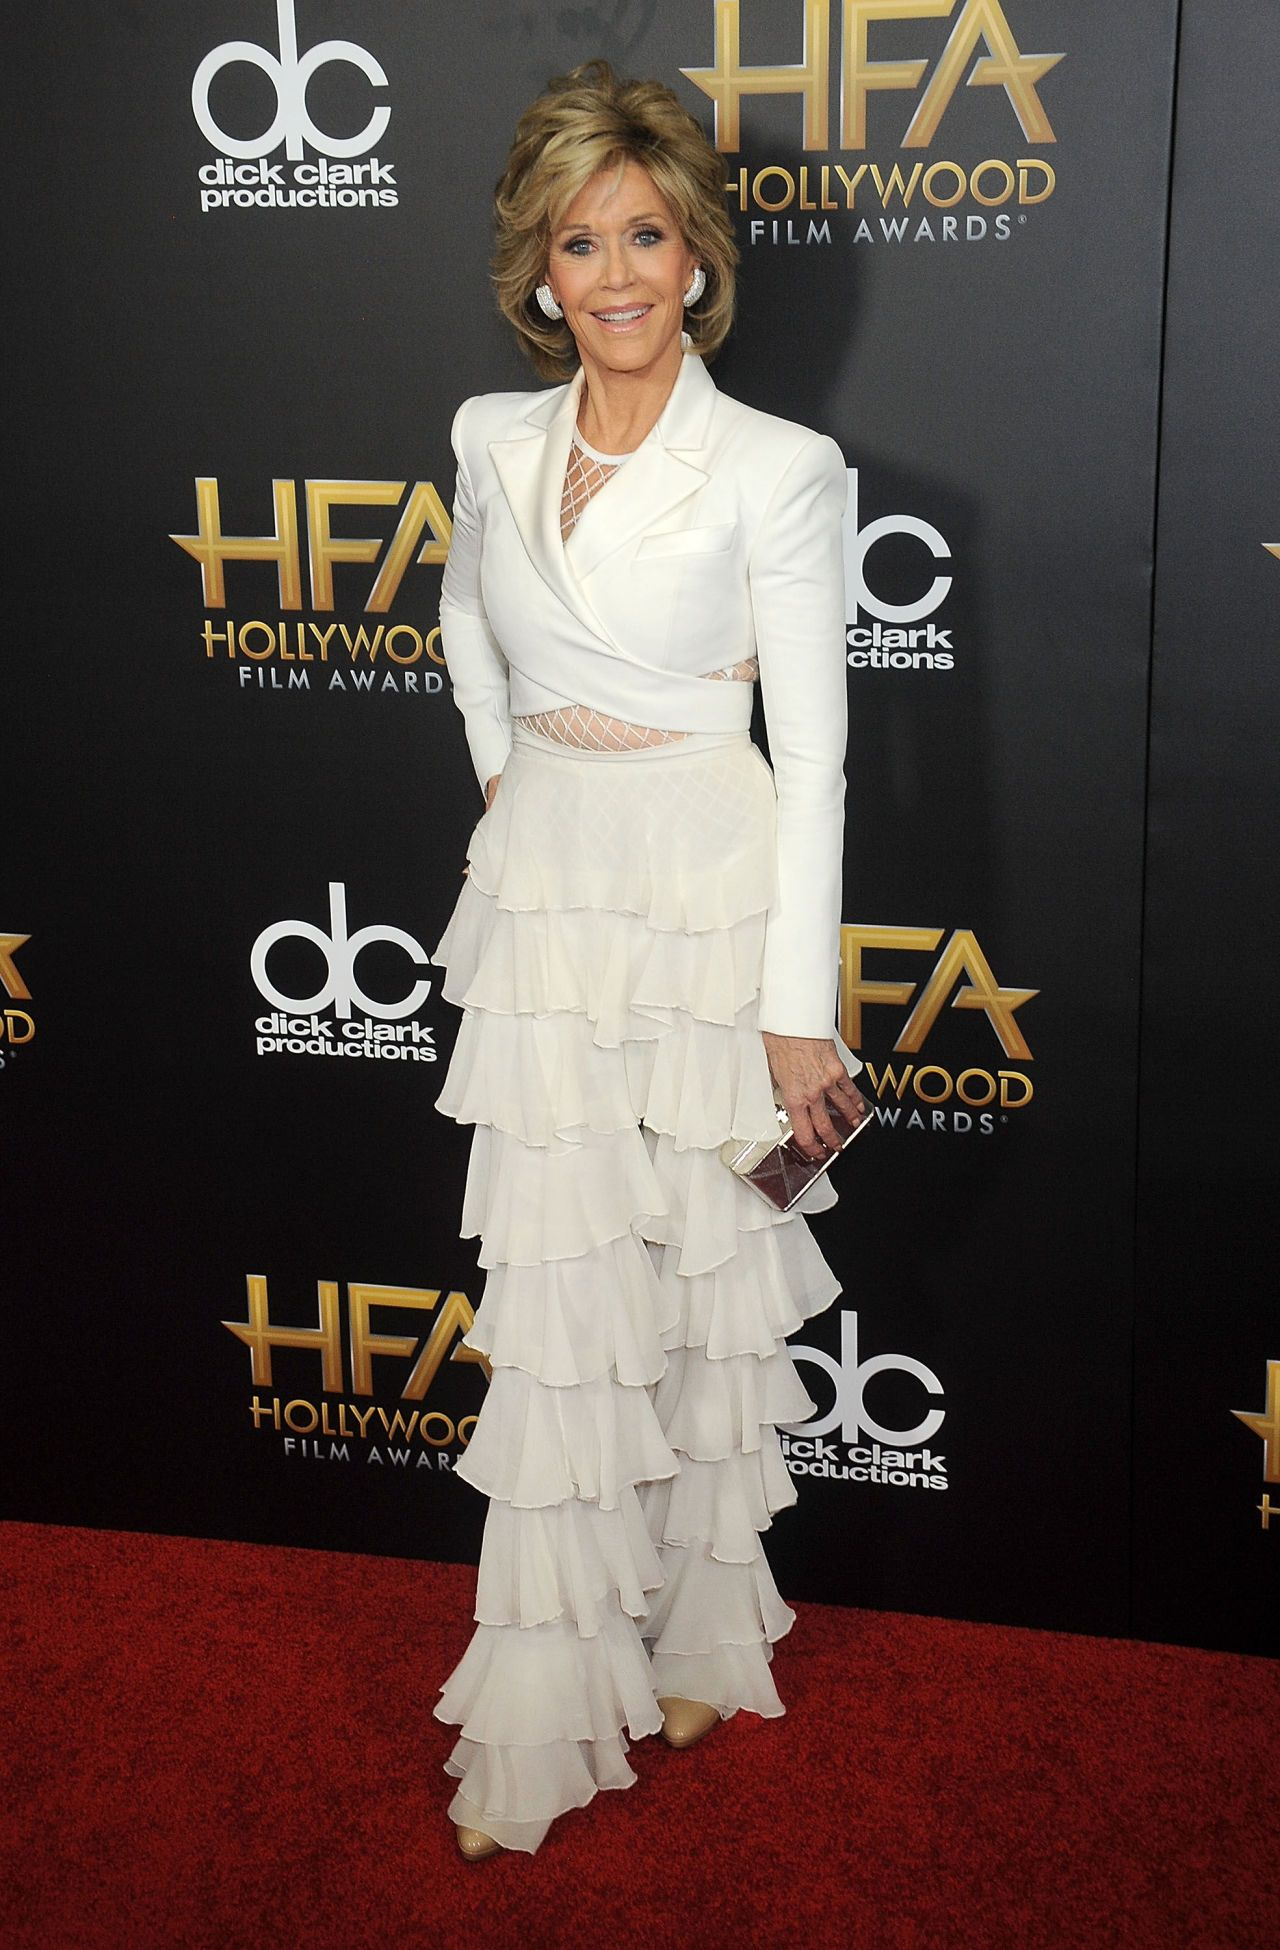 Jane Fonda Is Our Red Carpet Hero